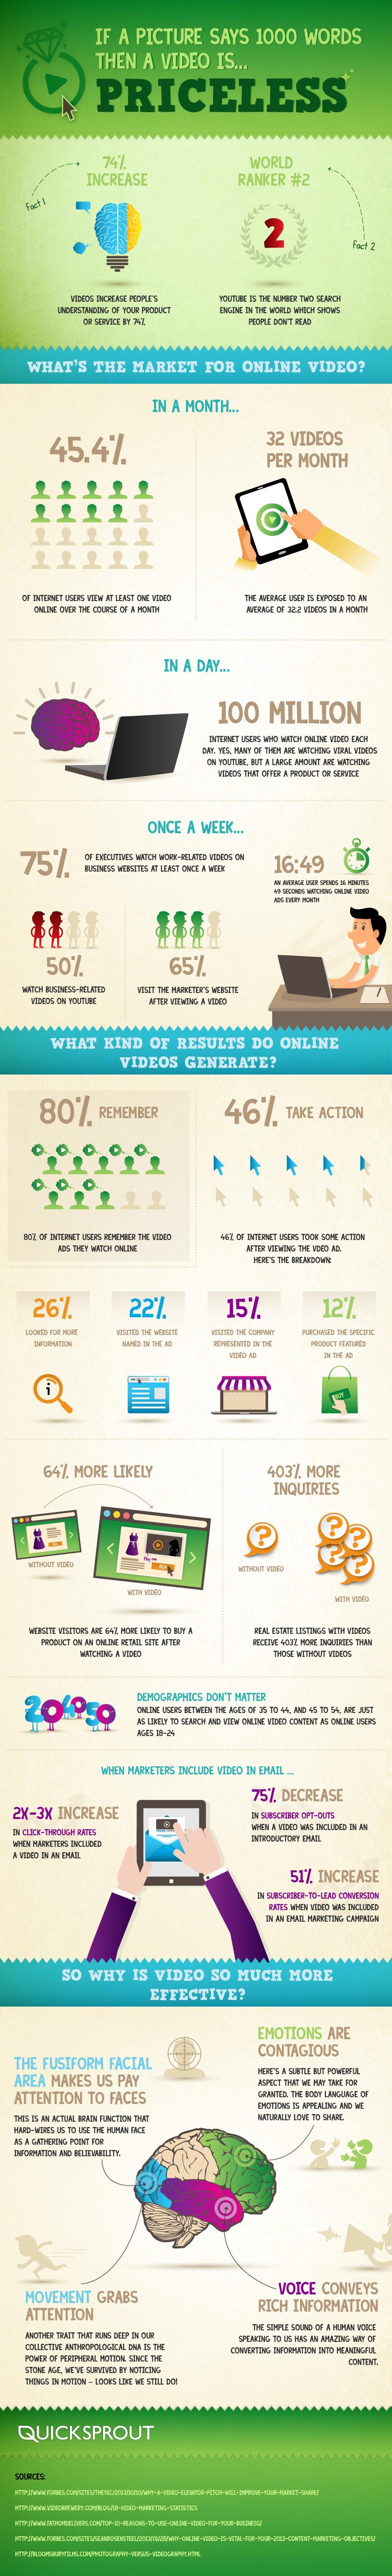 infographic online video market